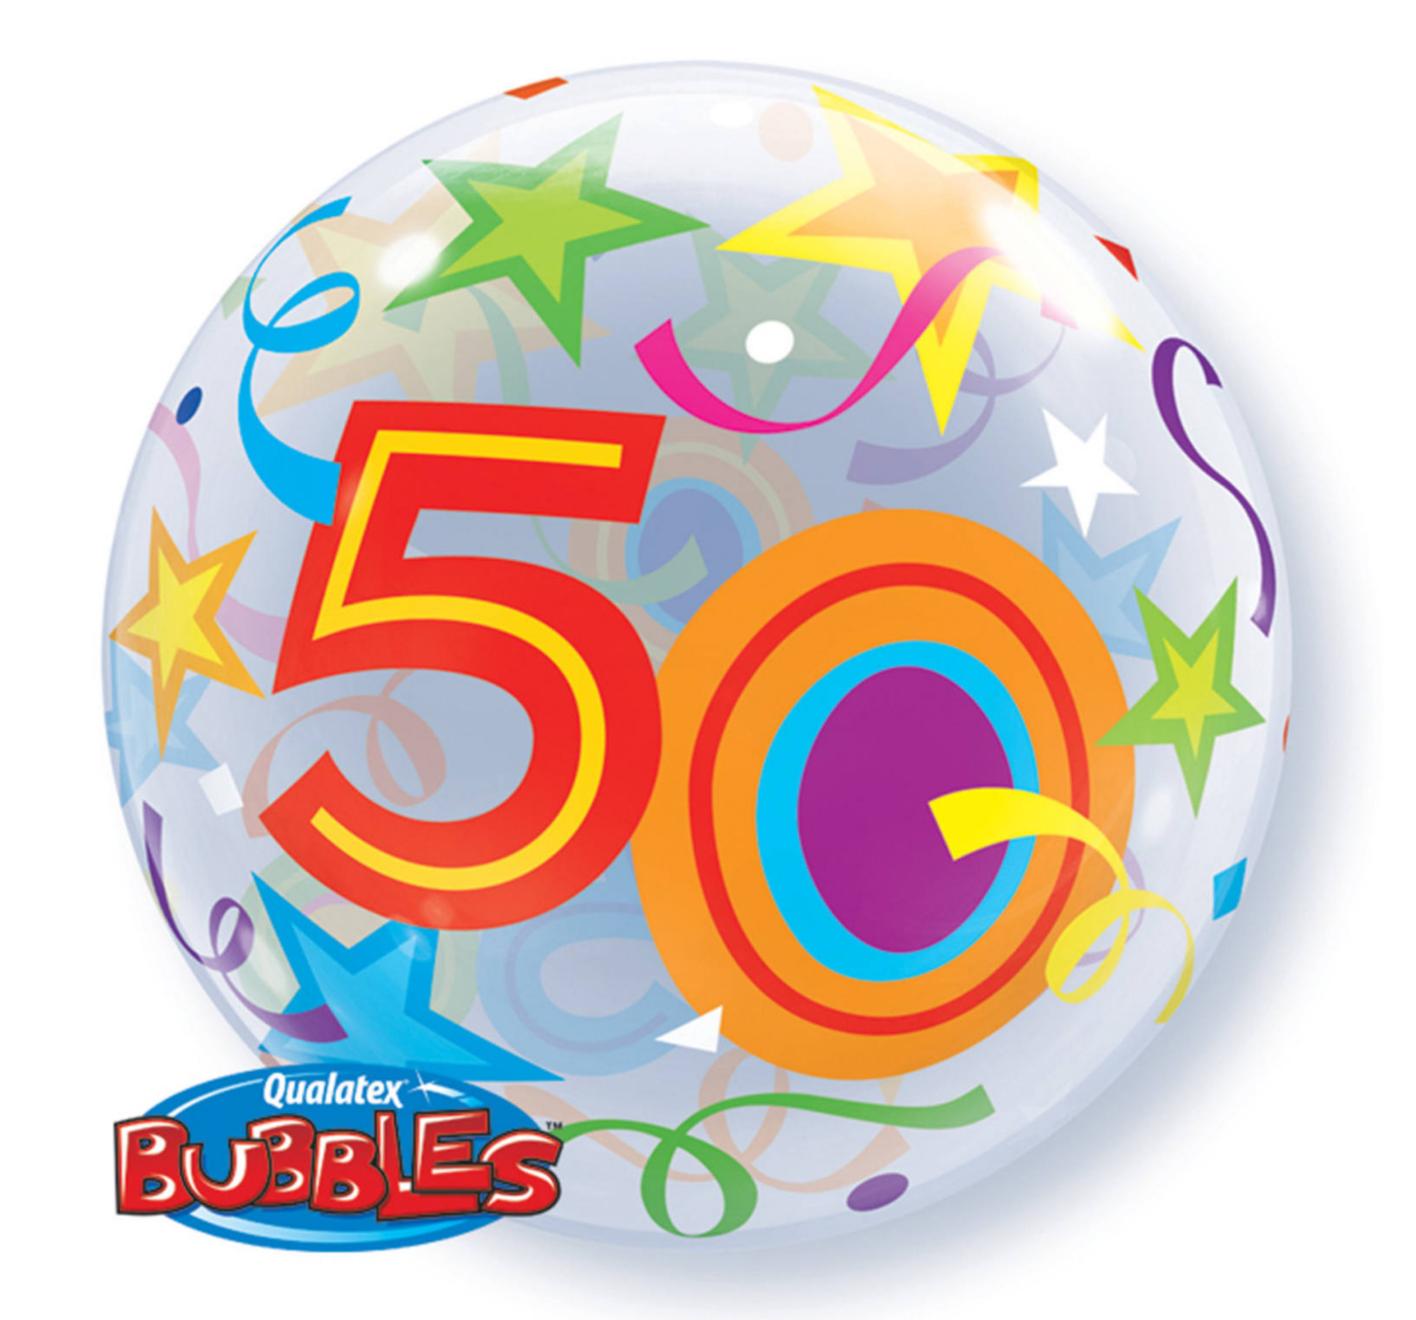 Folieballon - 50 Jaar - Bubble - 56cm - Zonder vulling - in Feestartikelen